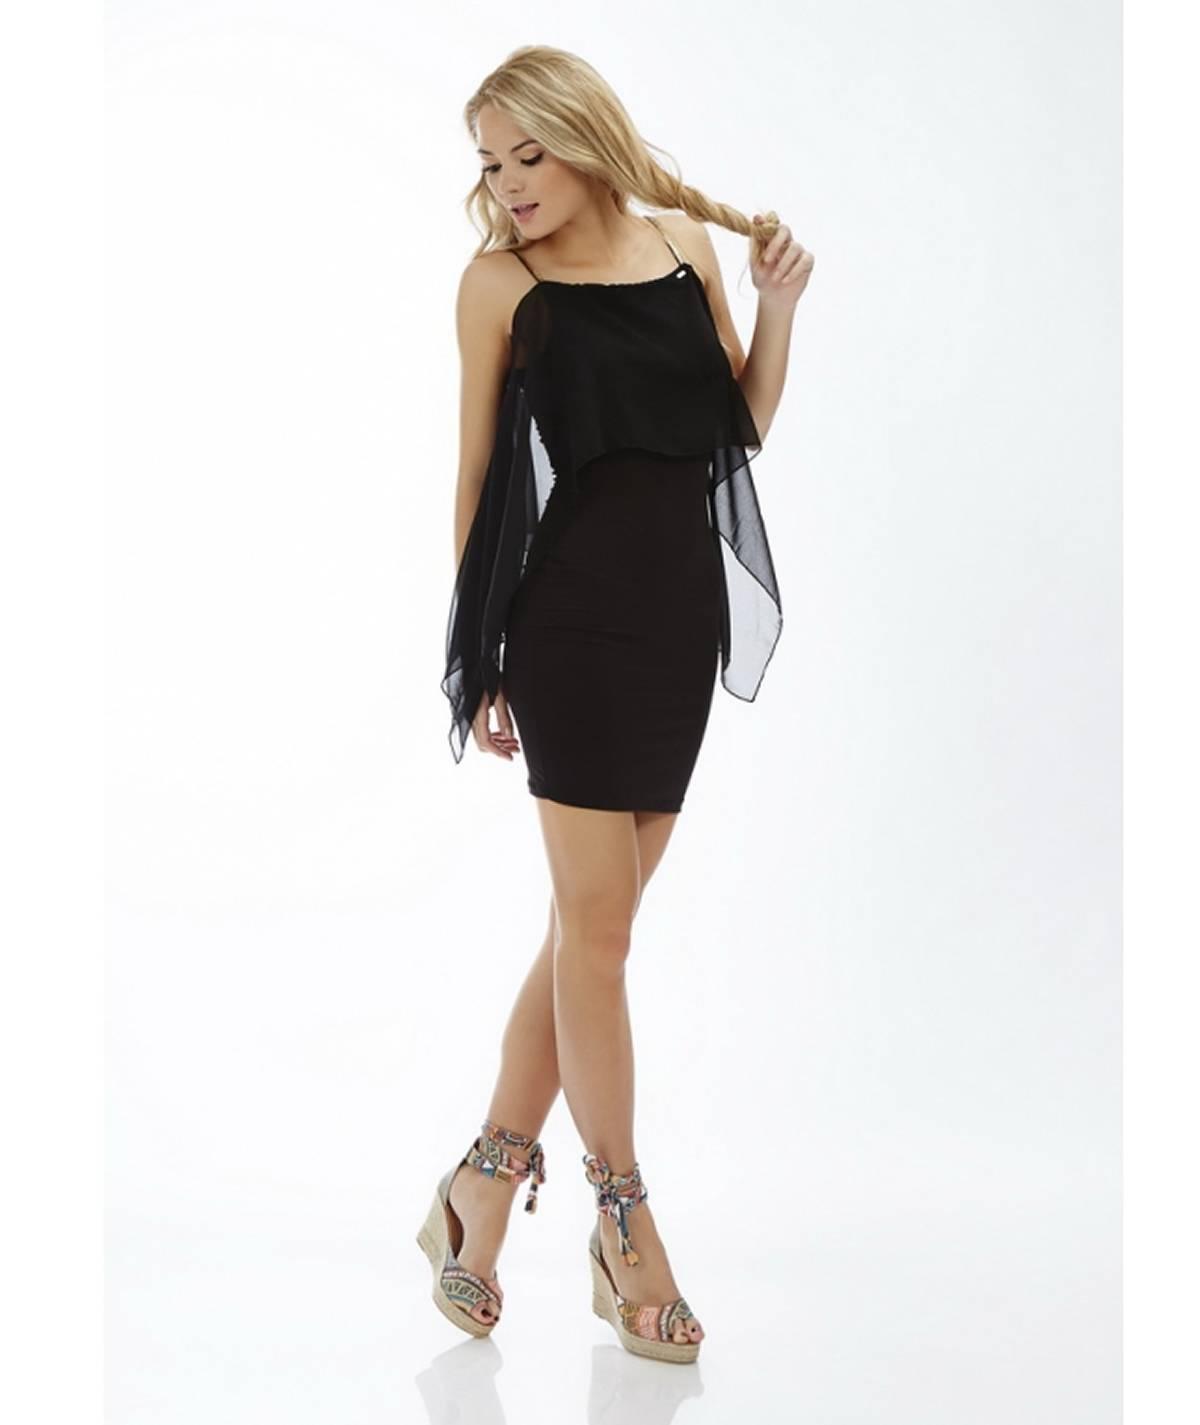 Dress with translucent ruffle